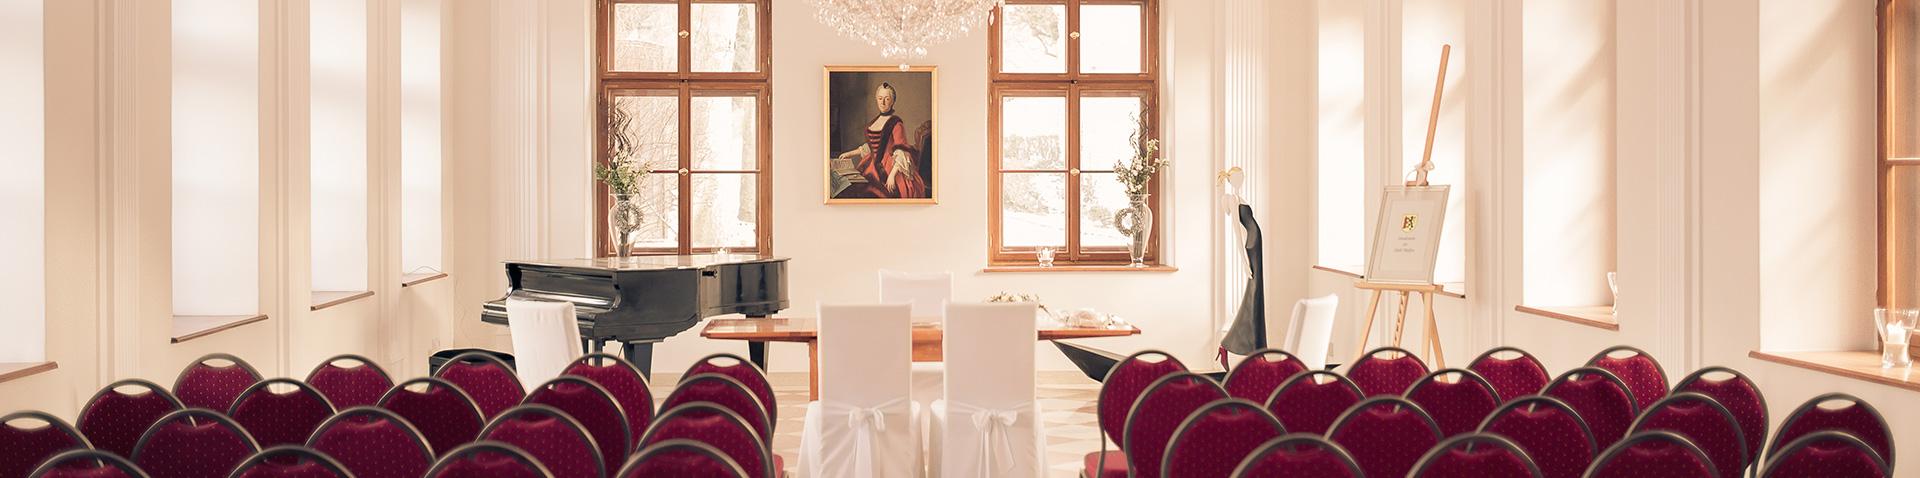 Festsaal - Schloss Proschwitz